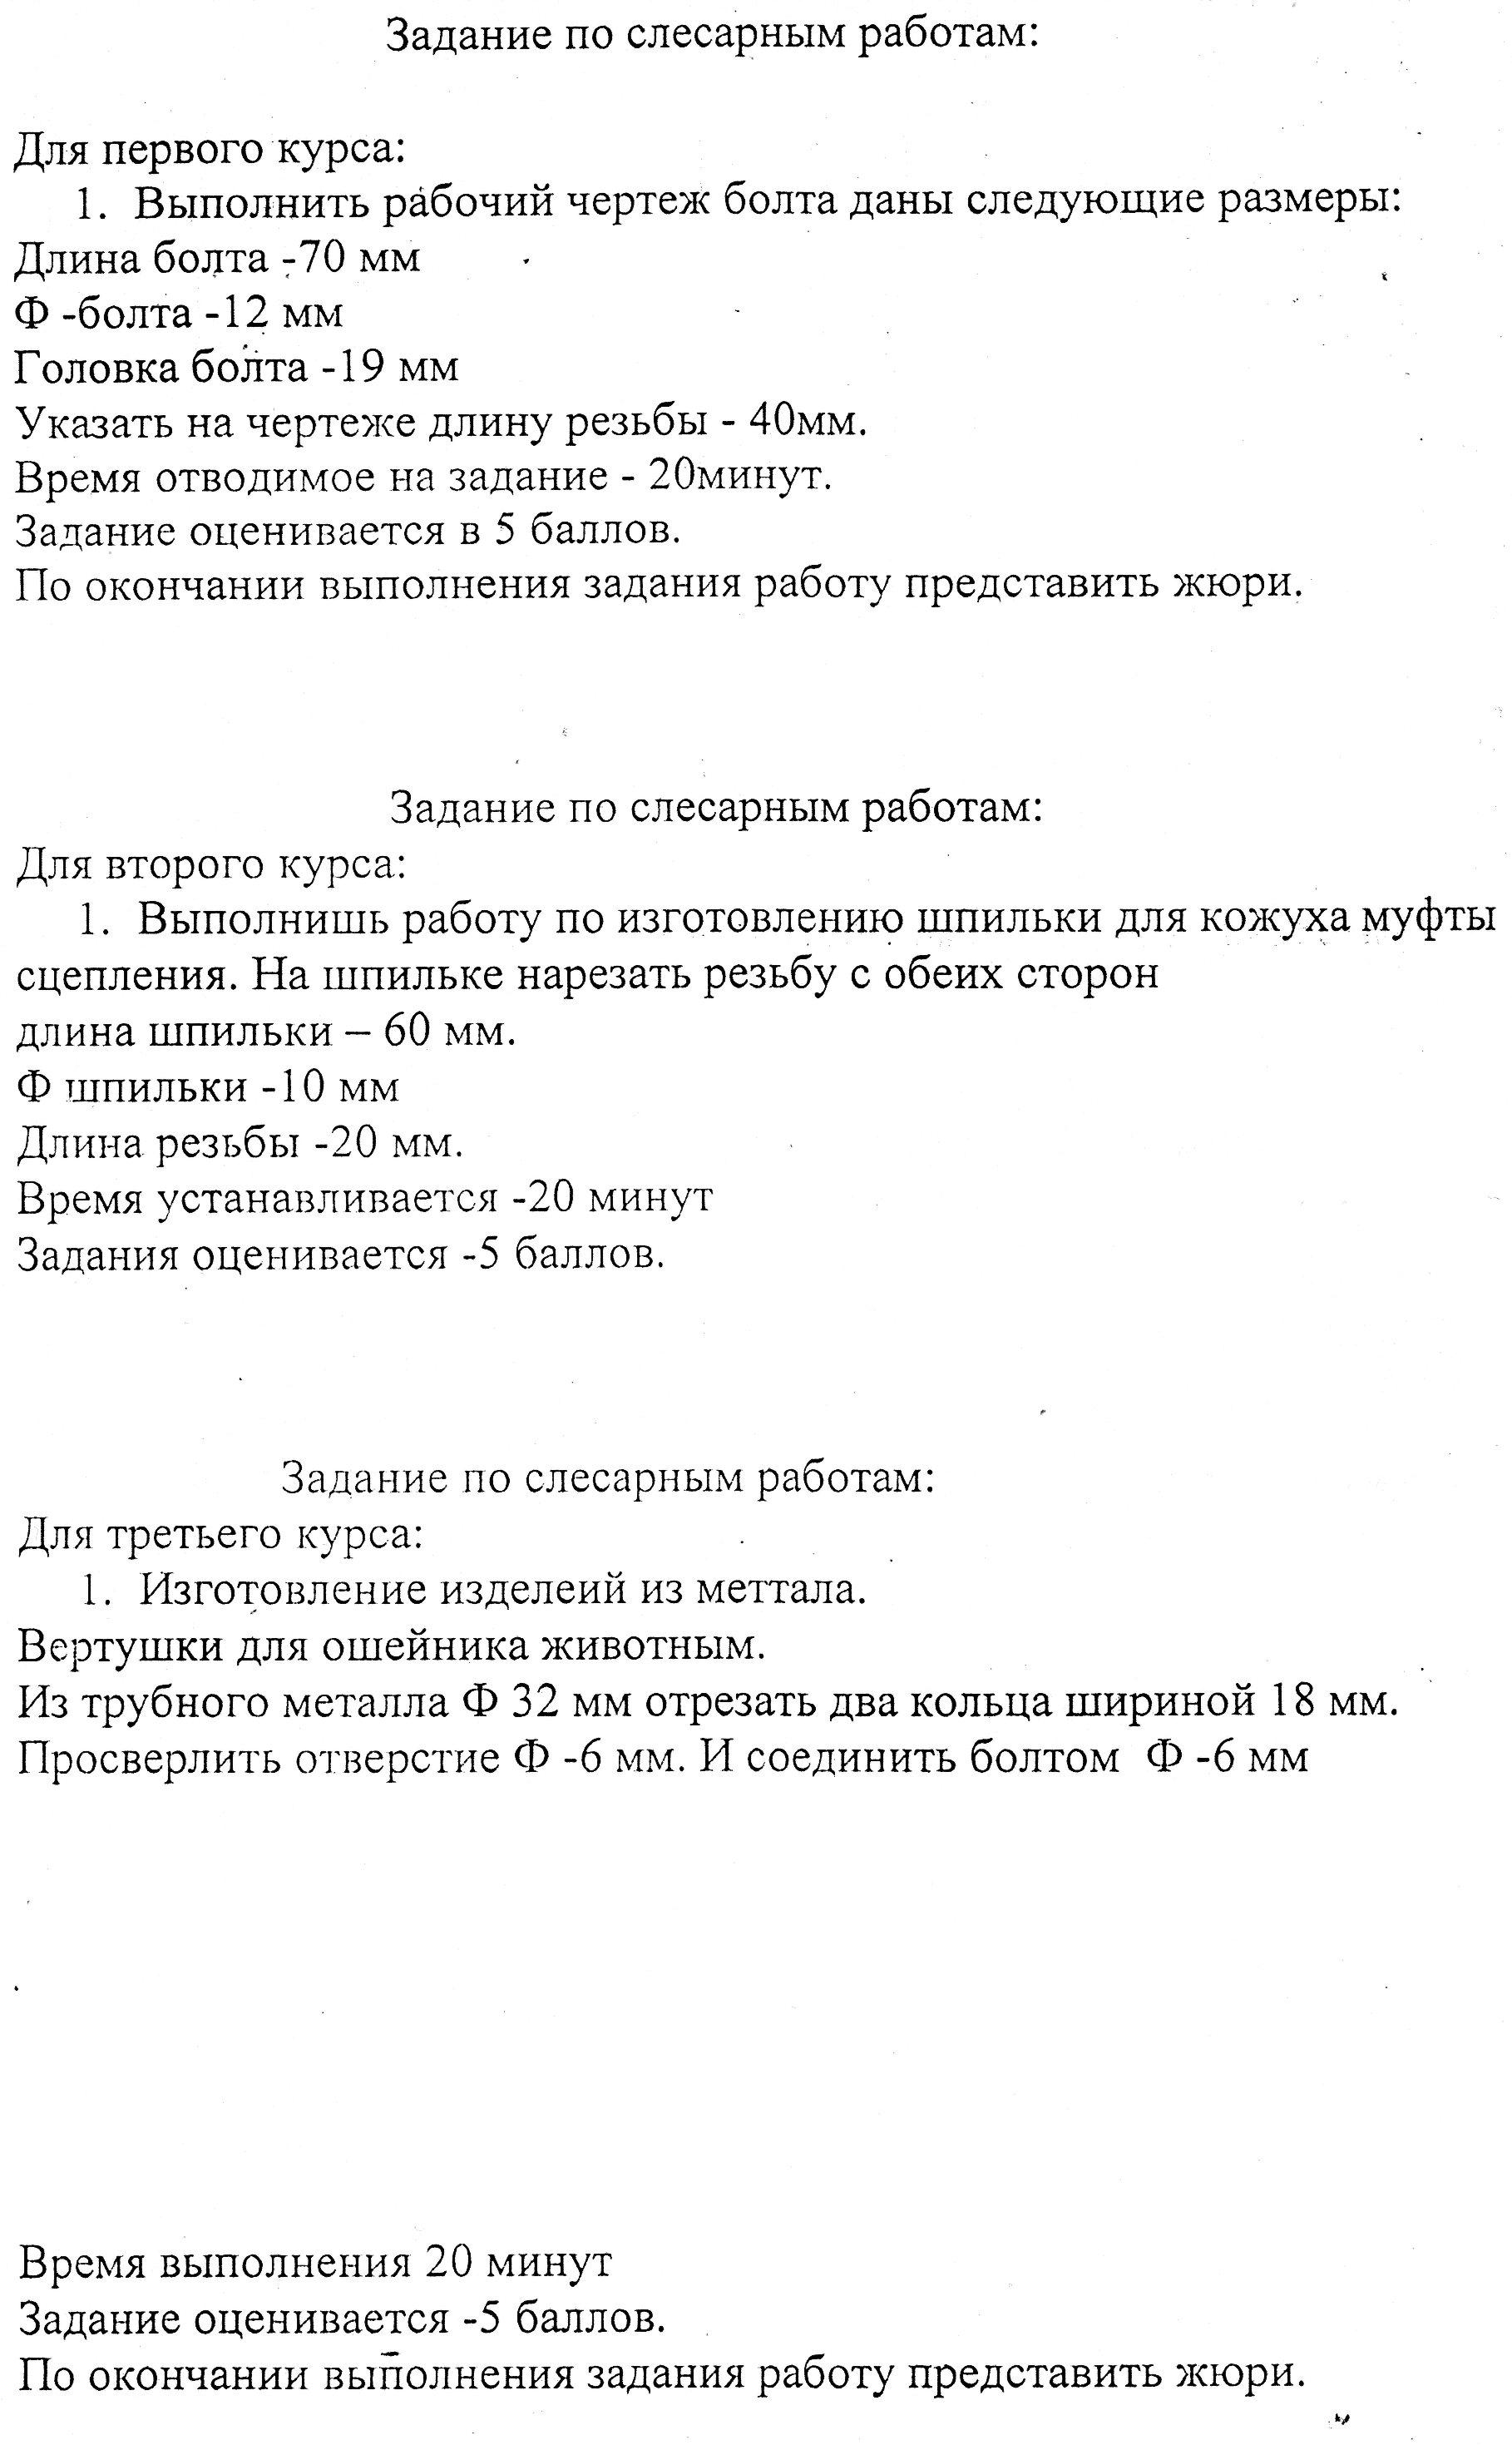 C:\Users\Василий Мельченко\Pictures\img566.jpg